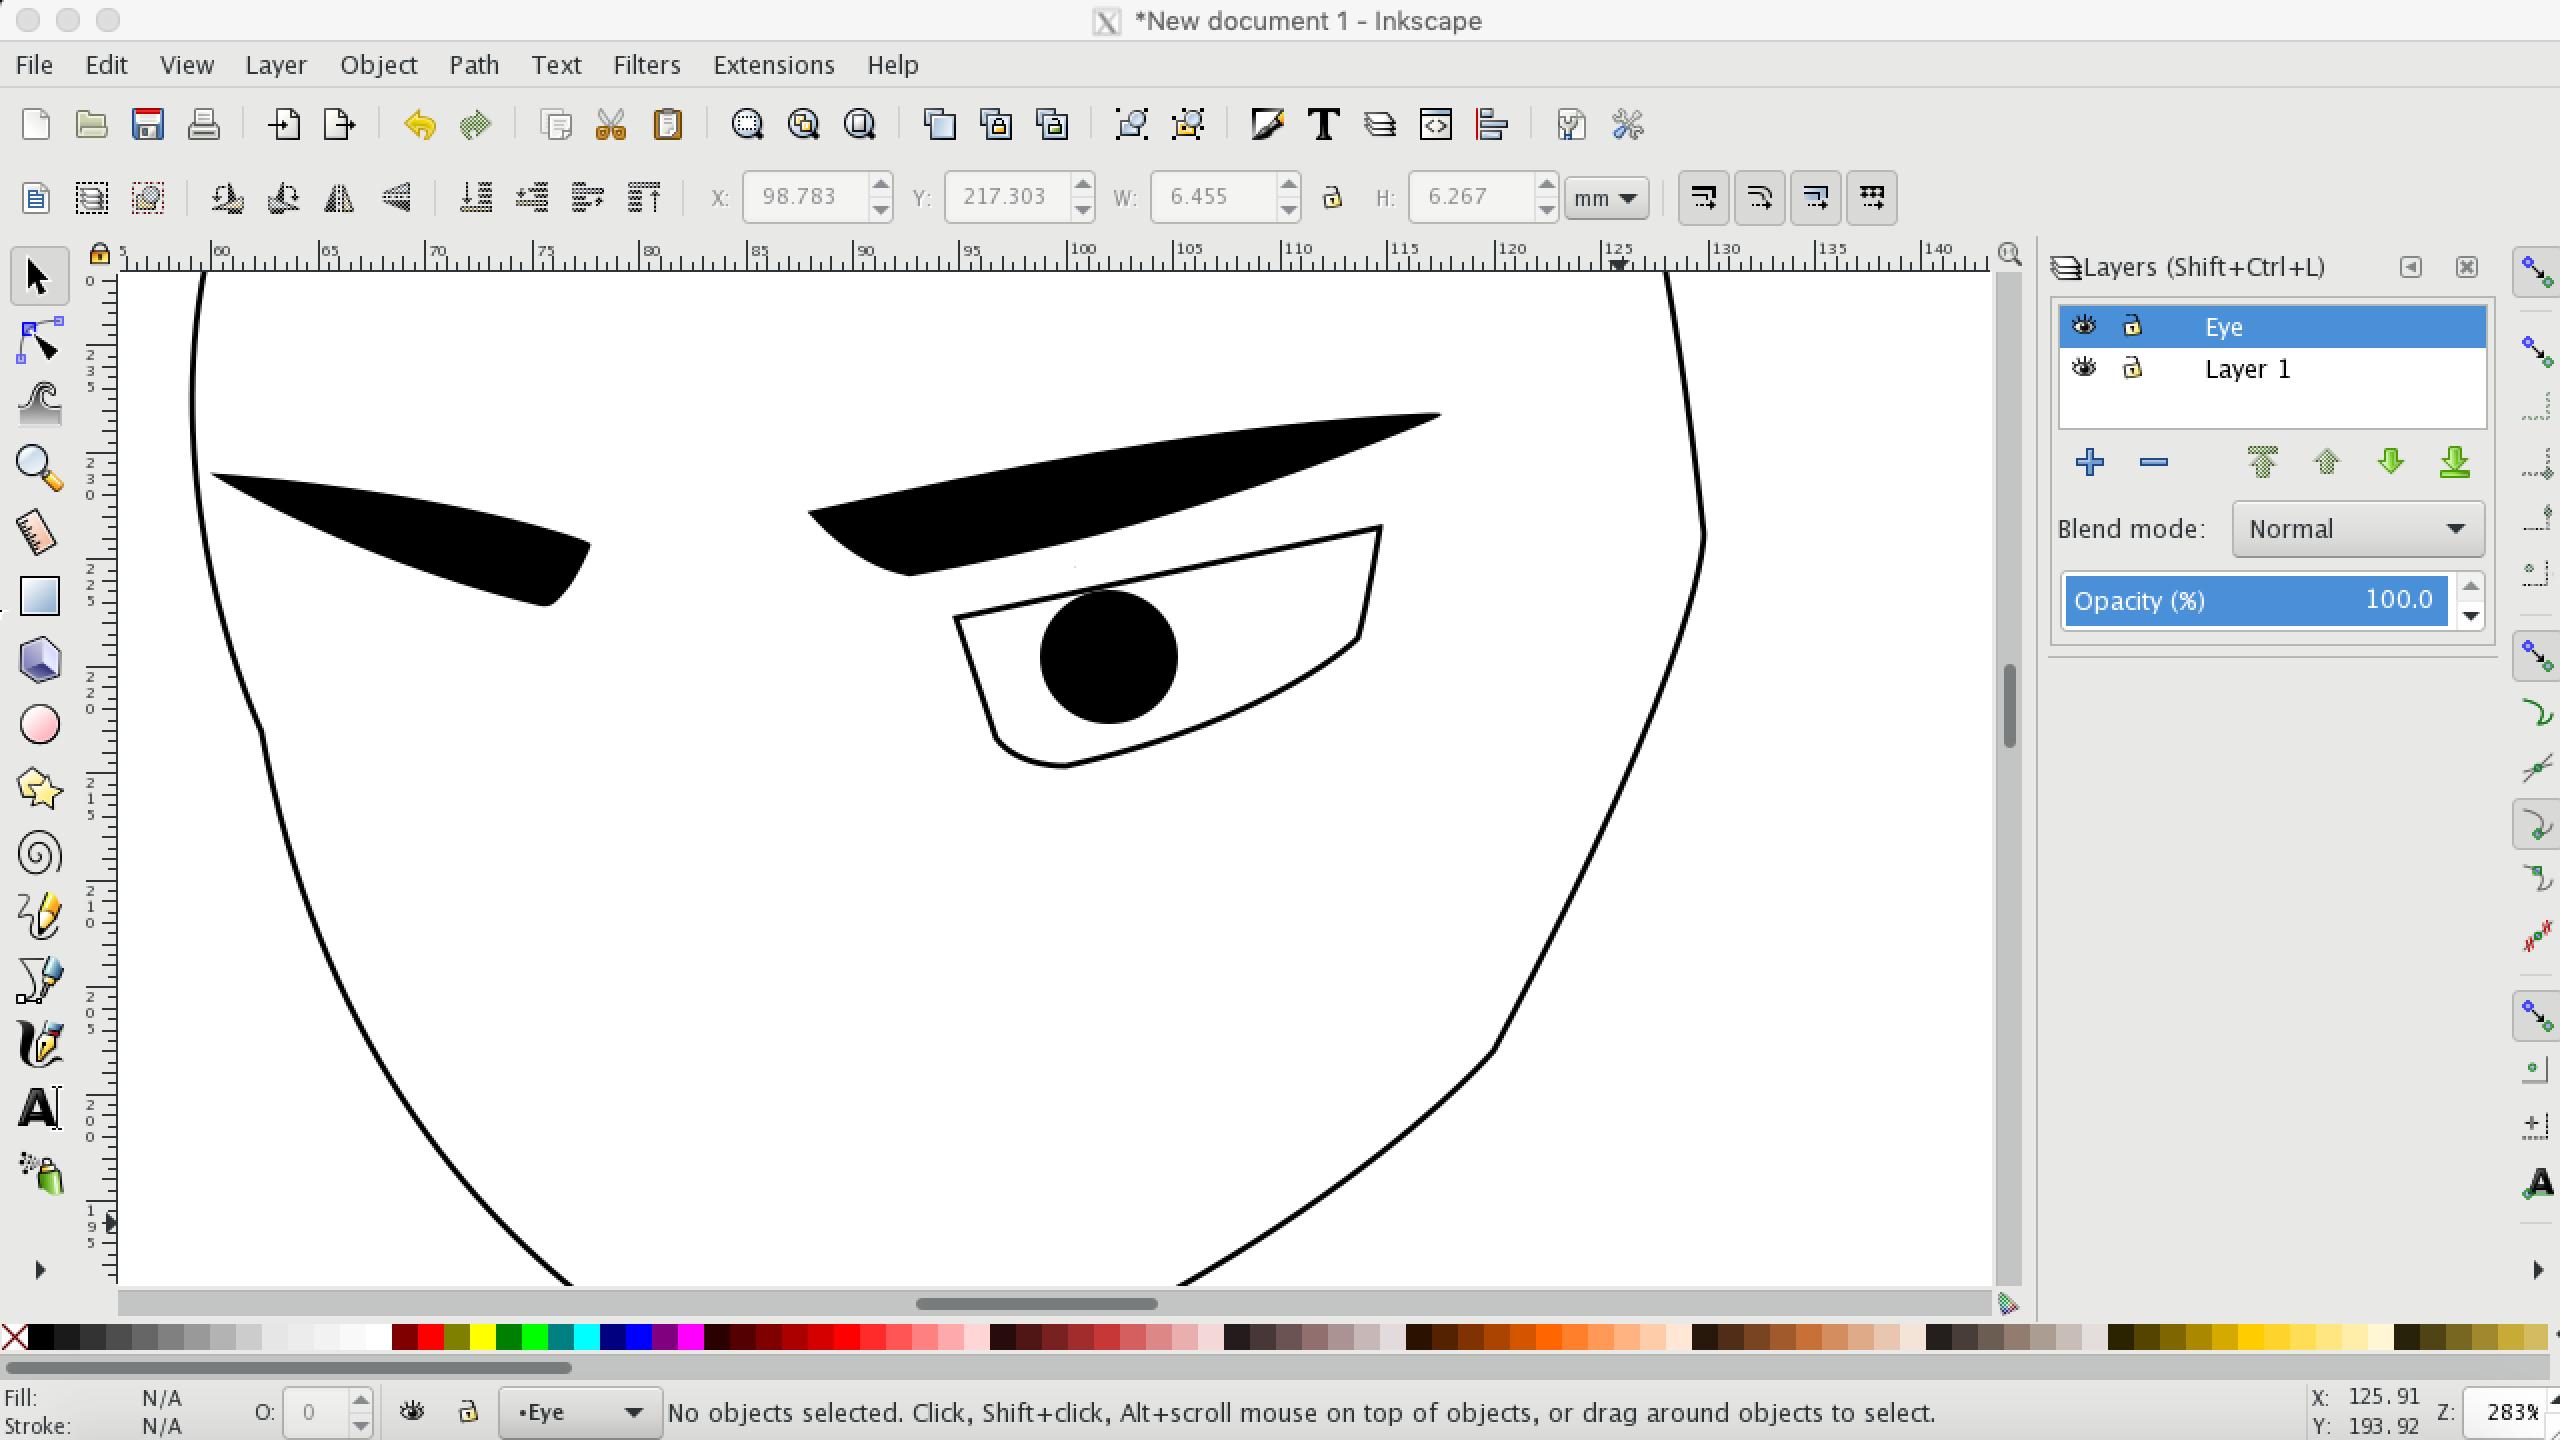 Inkscape แทน Adobe Illustrator ... พอไหวไหม? 1